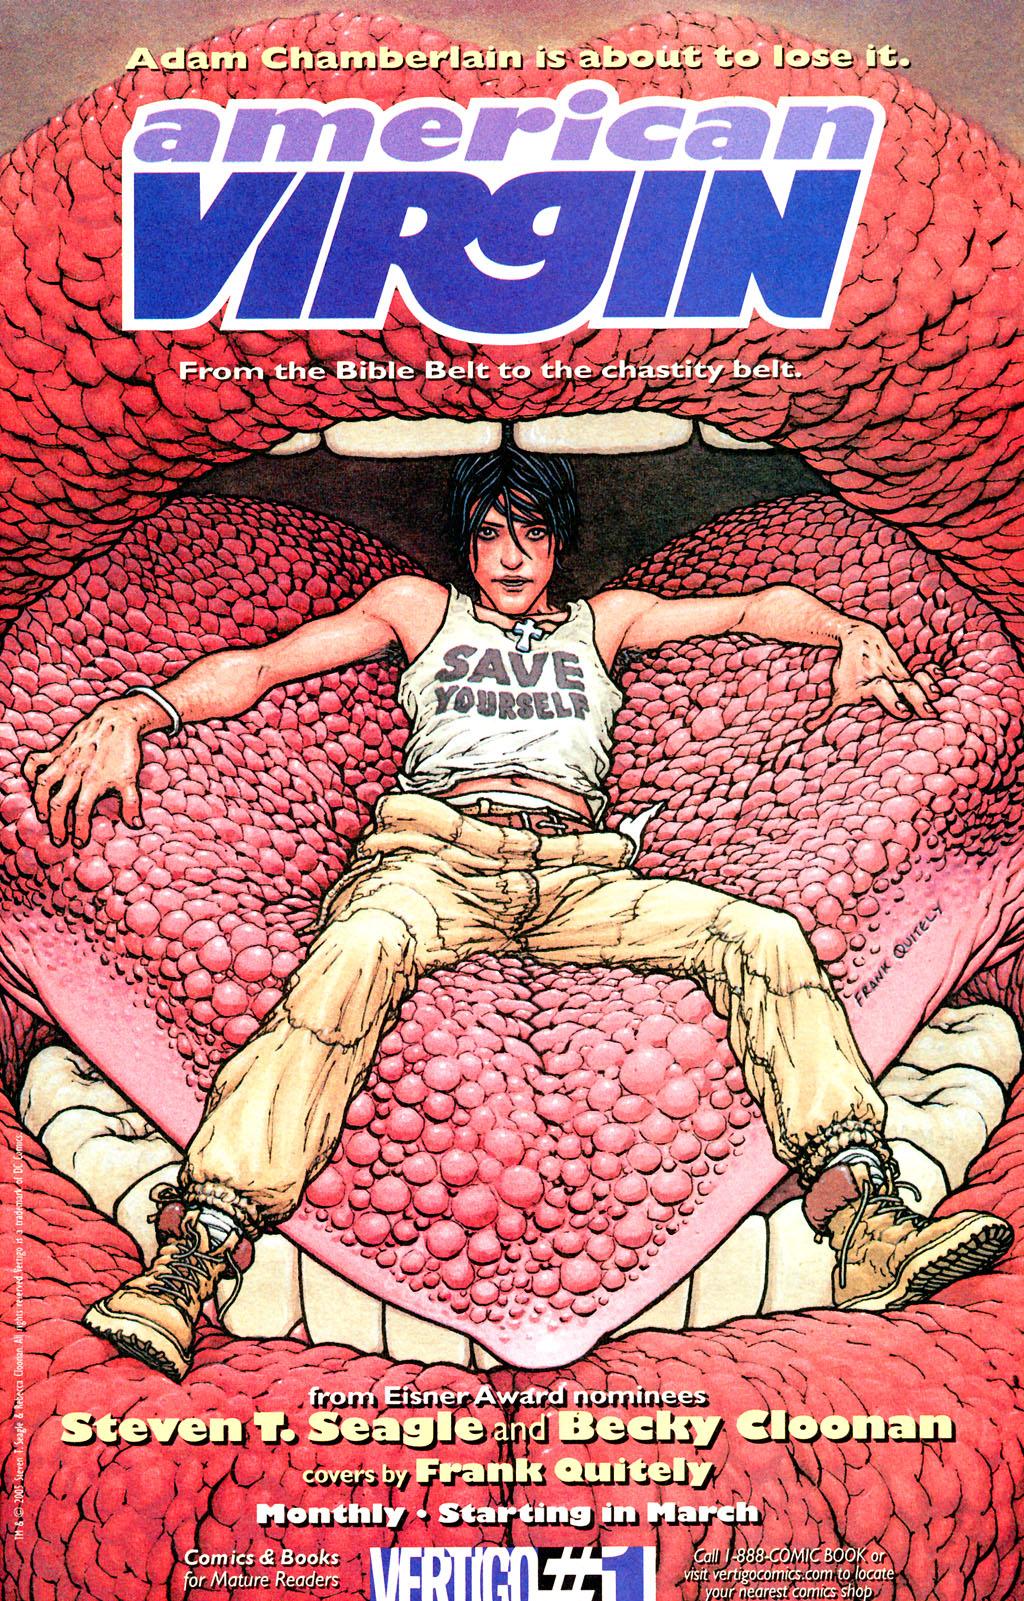 Read online The Exterminators comic -  Issue #3 - 31